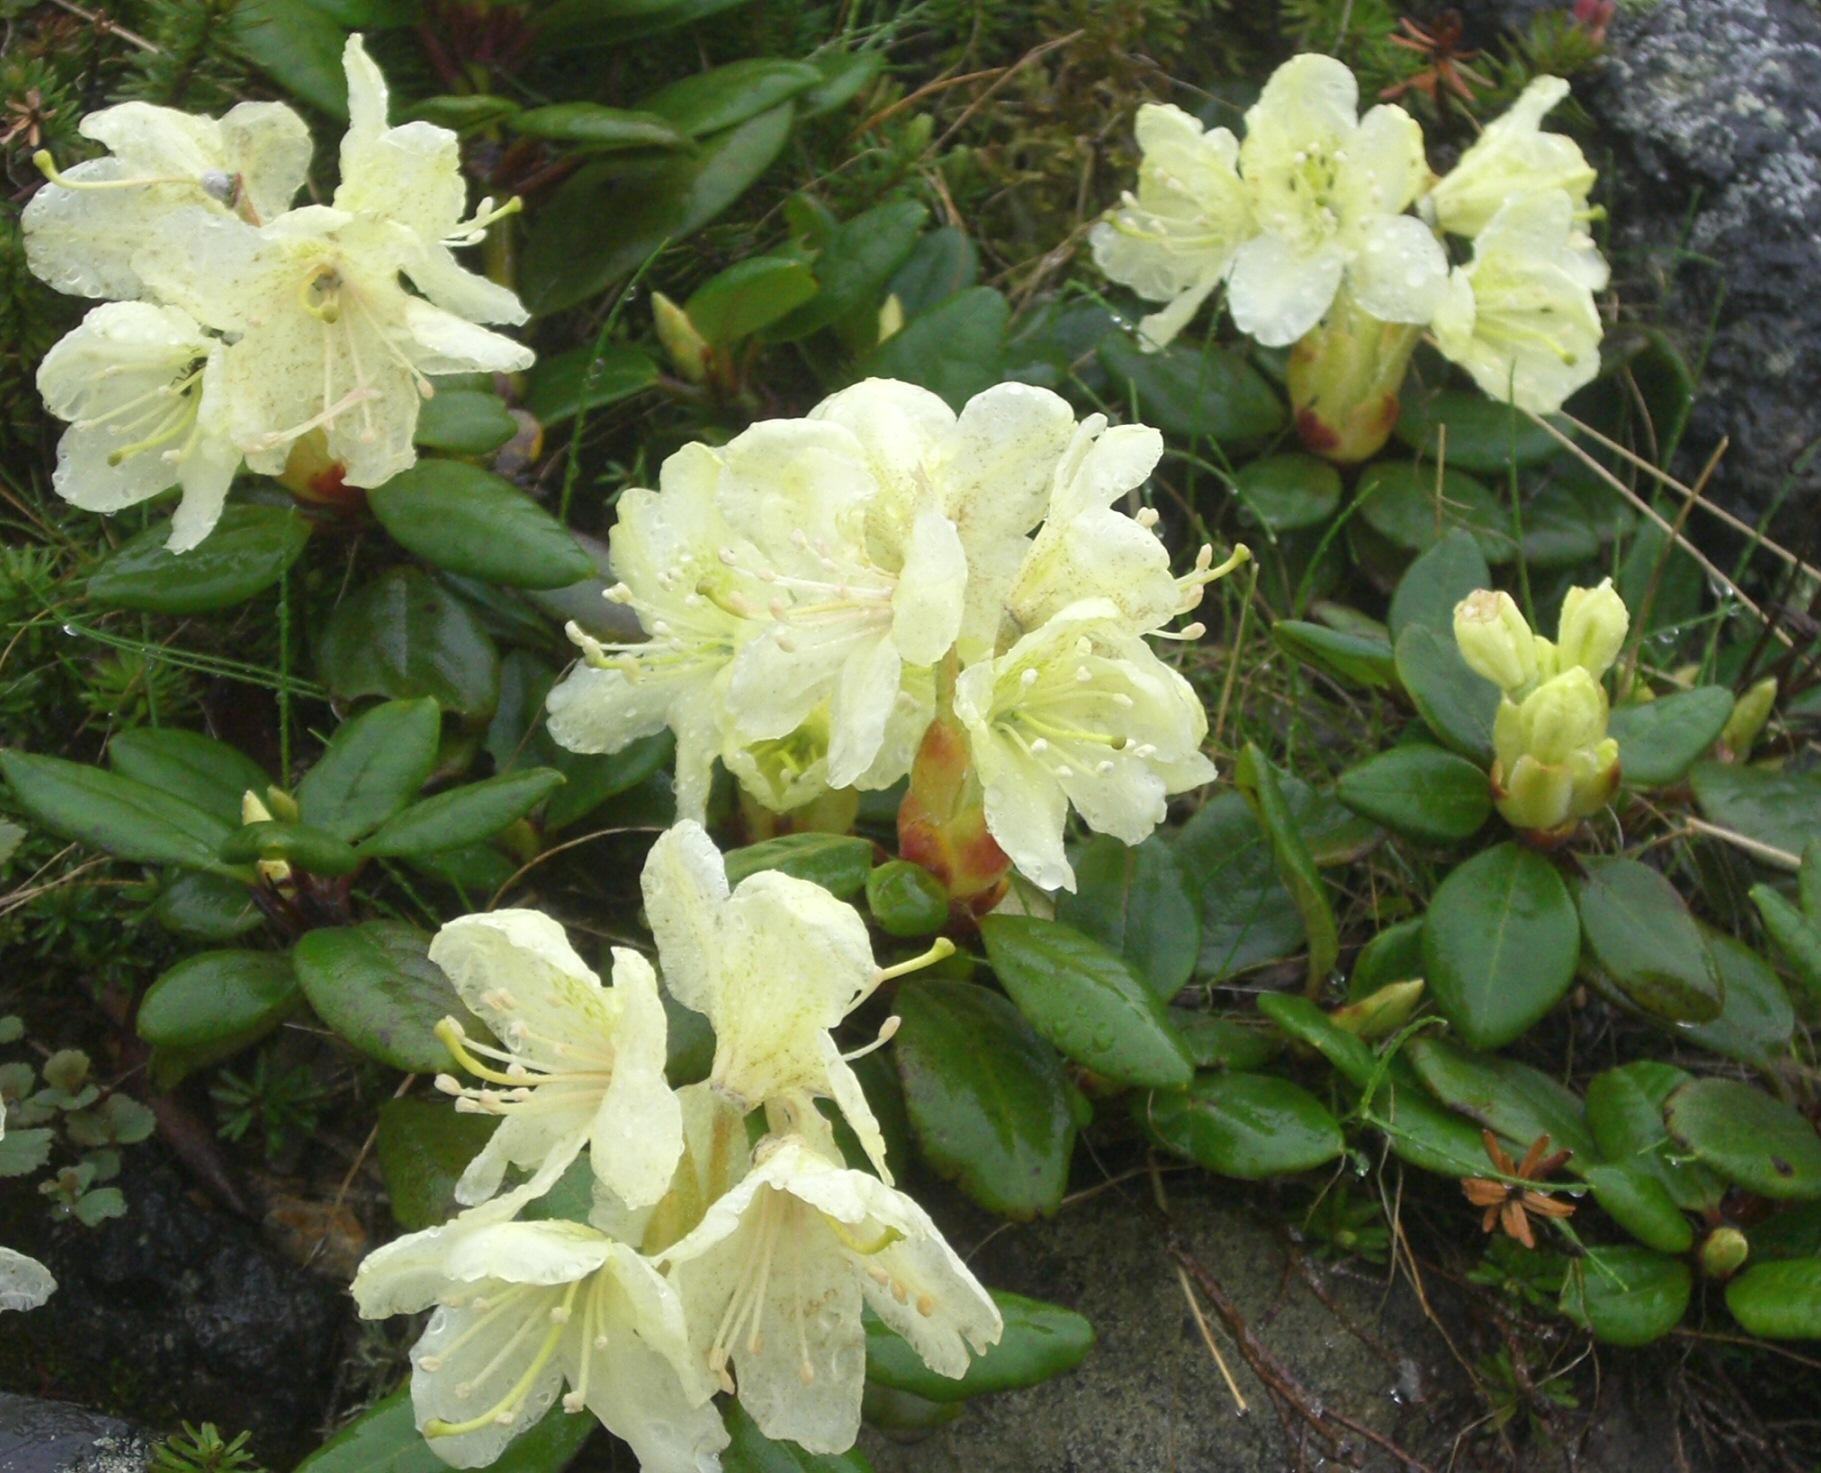 Rhododendron aureum க்கான பட முடிவு